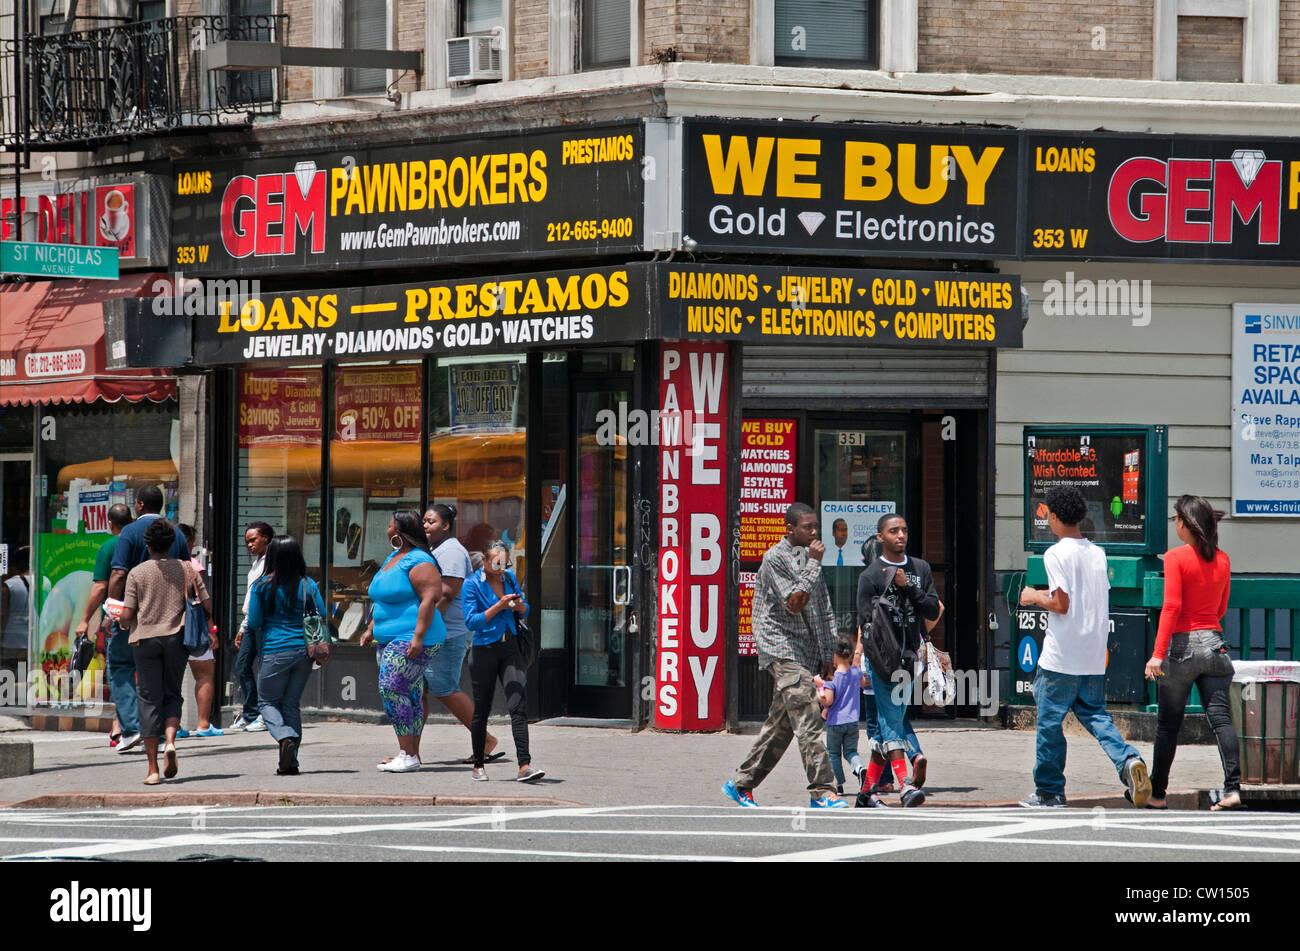 Cash advance haltom city image 3